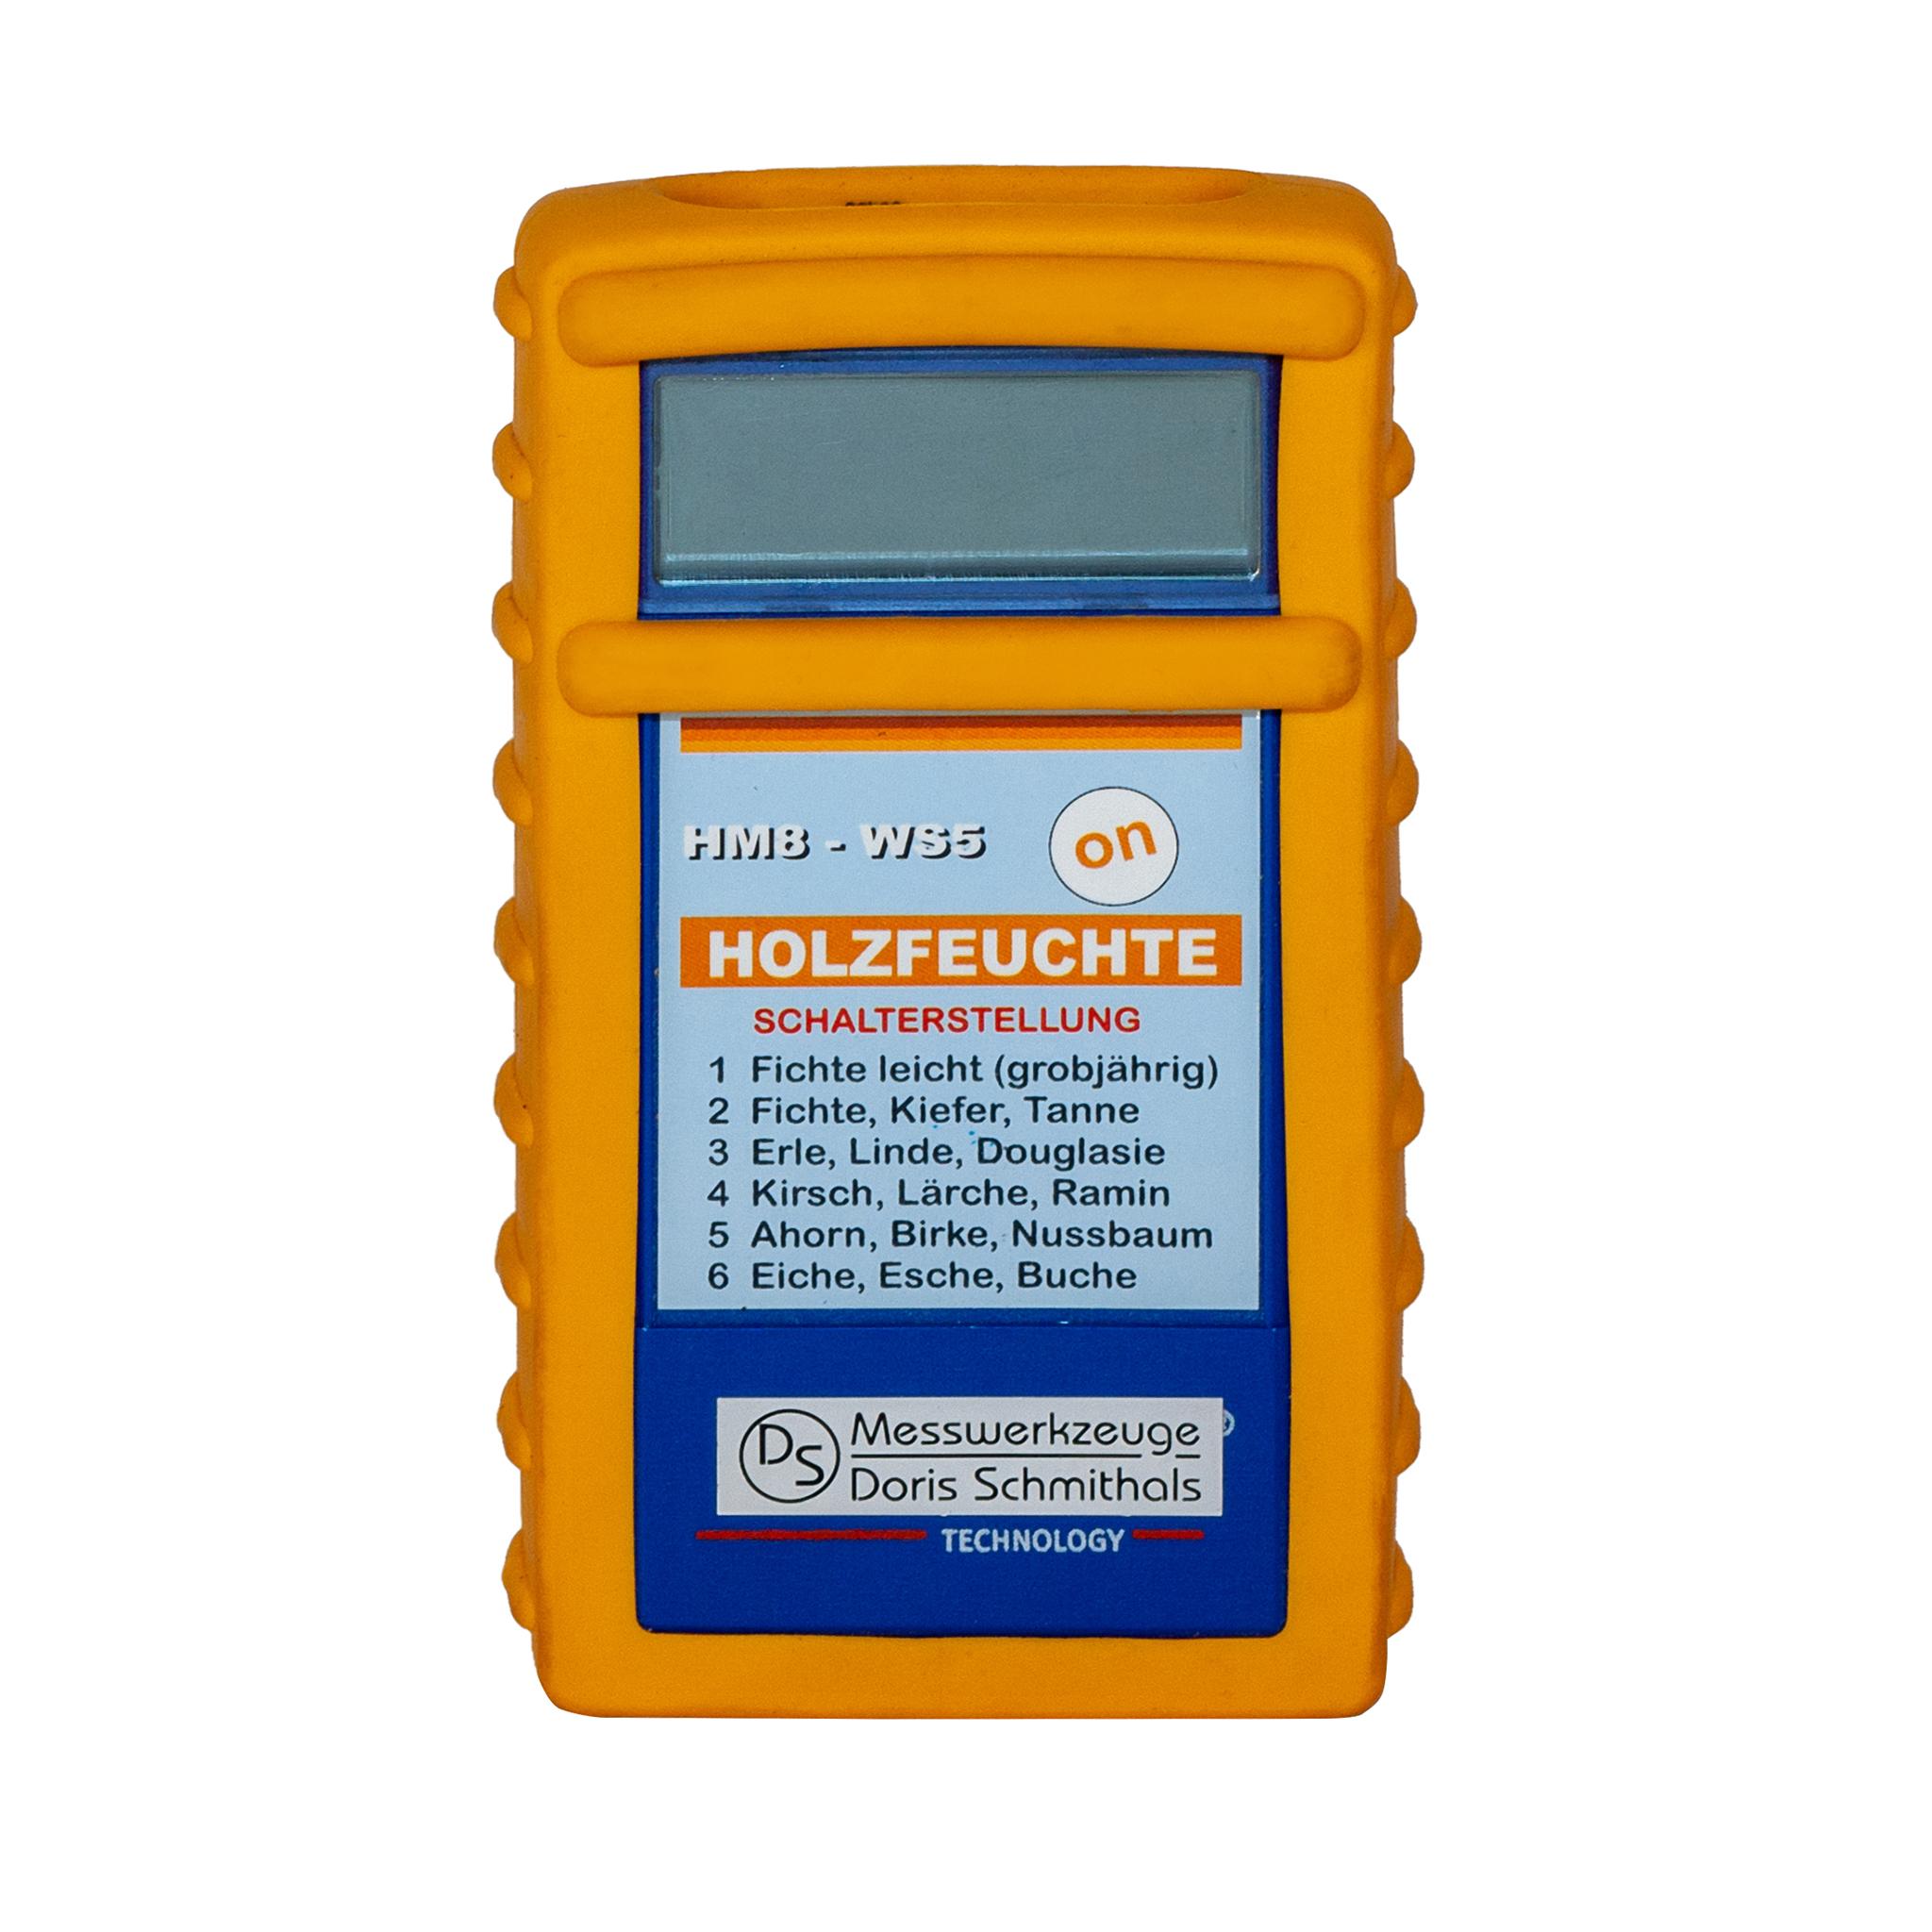 Holzfeuchtermessgerät HM8-WS5